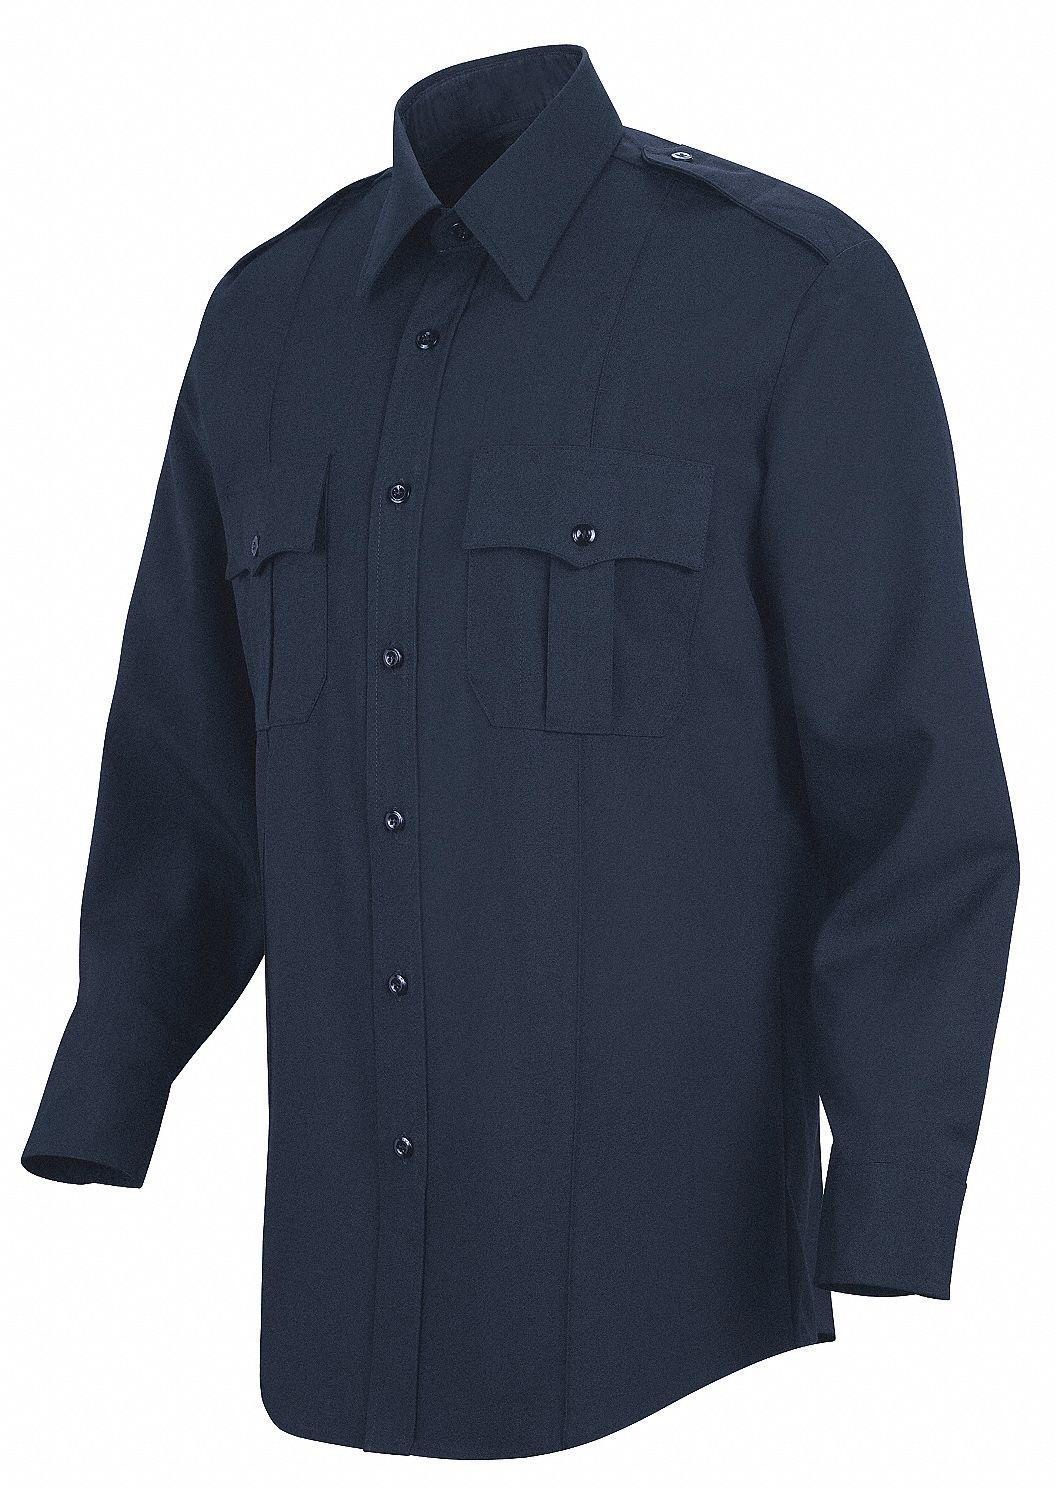 1736 Horace Small Deputy Deluxe Shirt Dark Navy